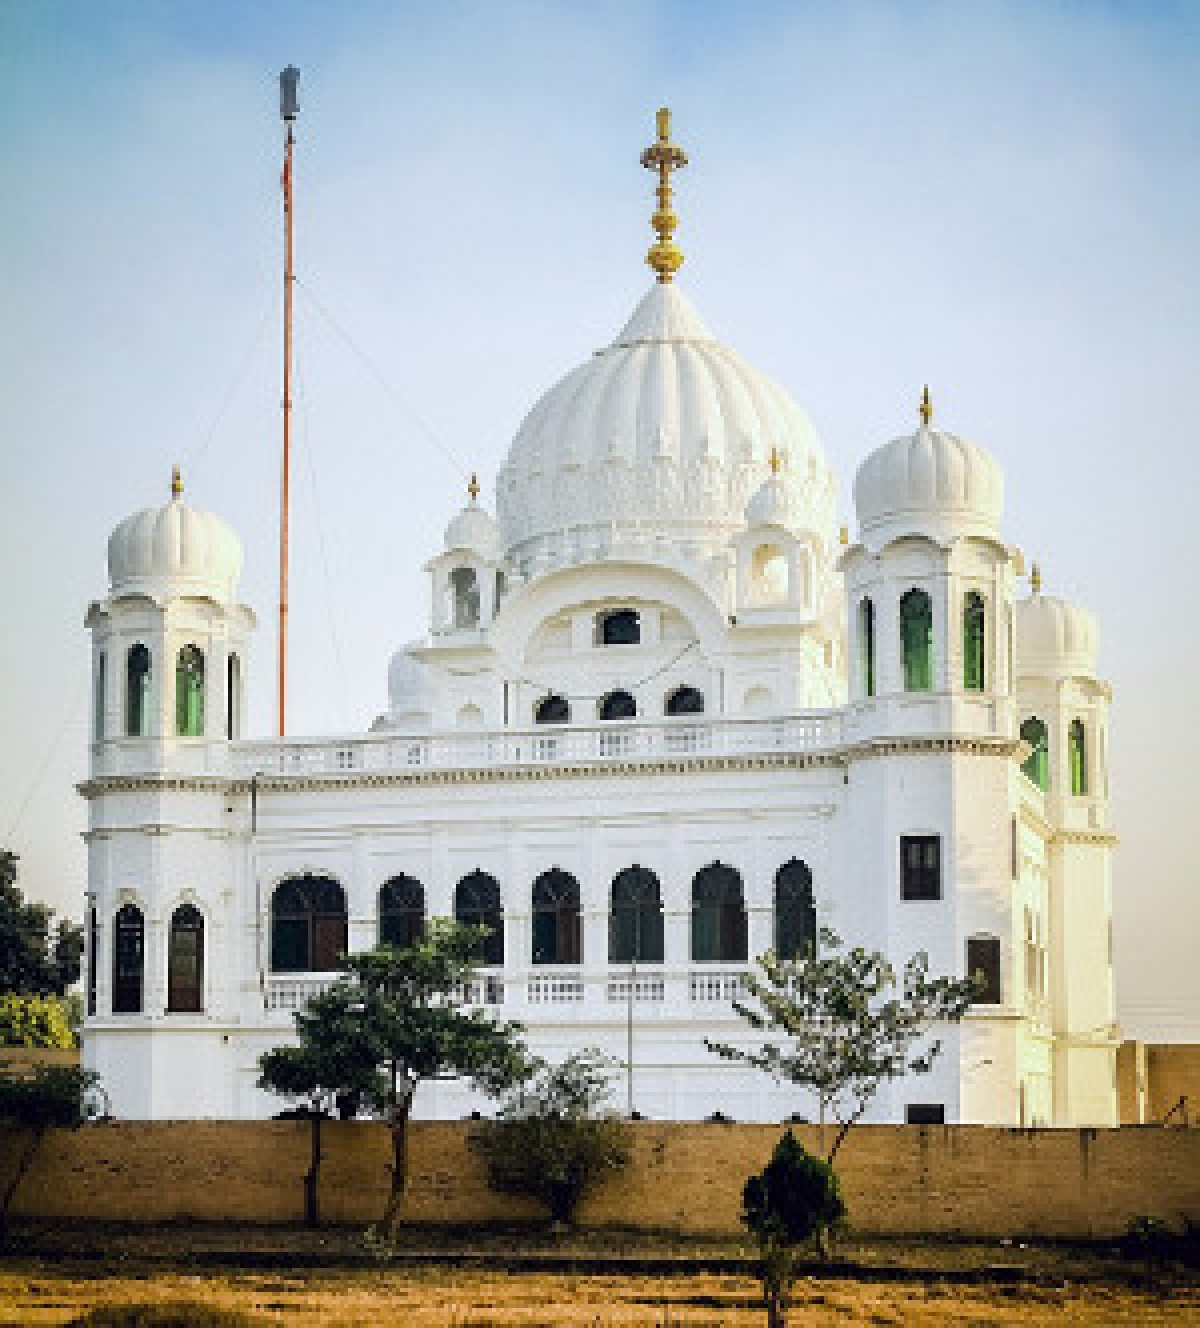 Kartarpur Sahib gurdwara in Pakistan  (Photo: Xubayr Mayo, Wikimedia Commons)